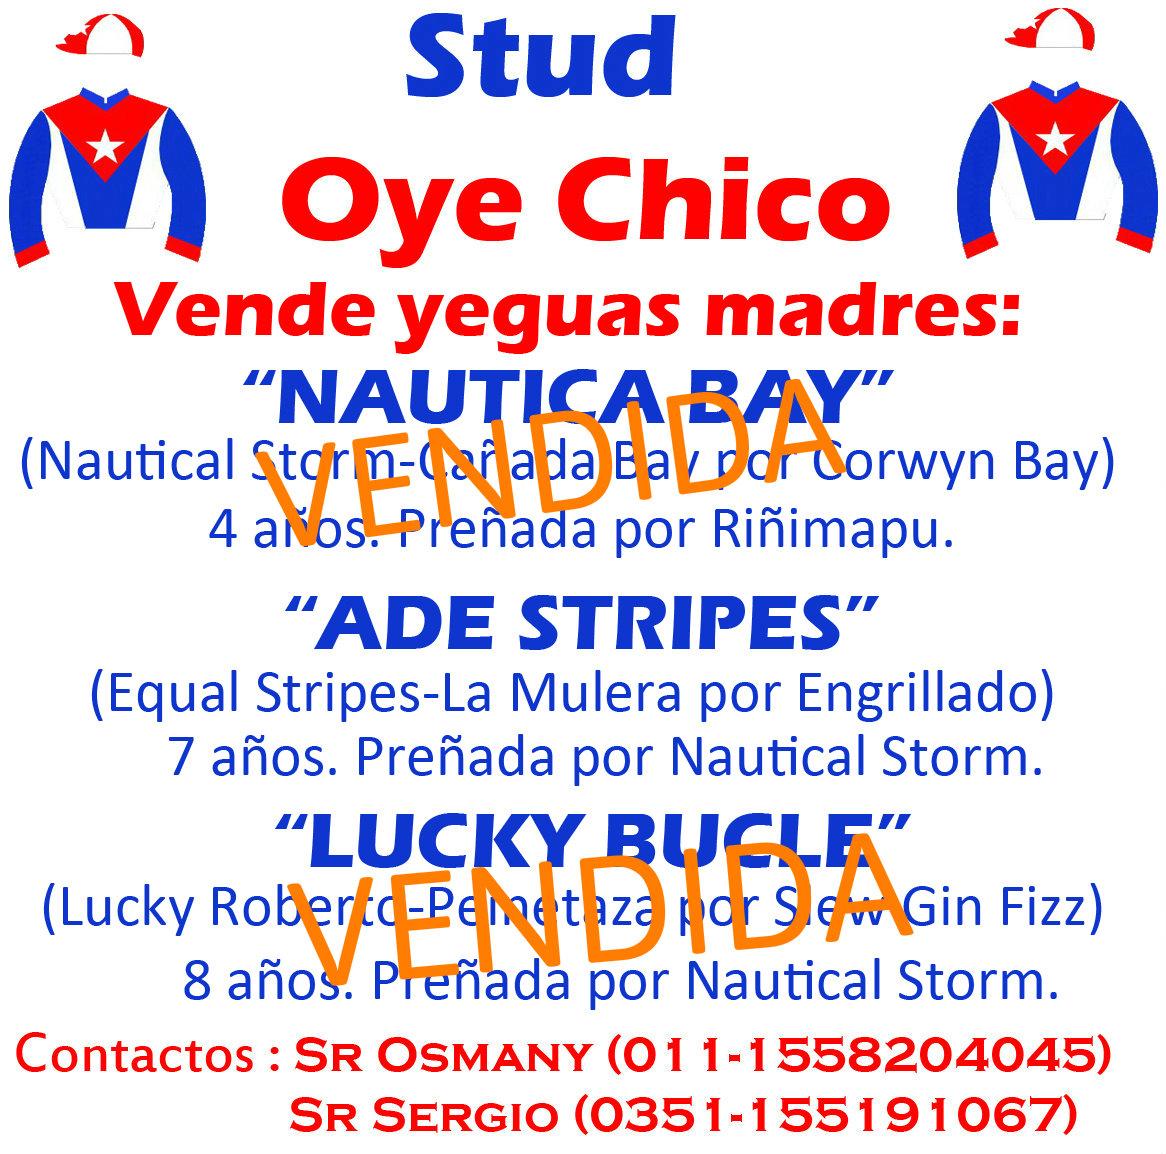 OYE CHICO MADRES